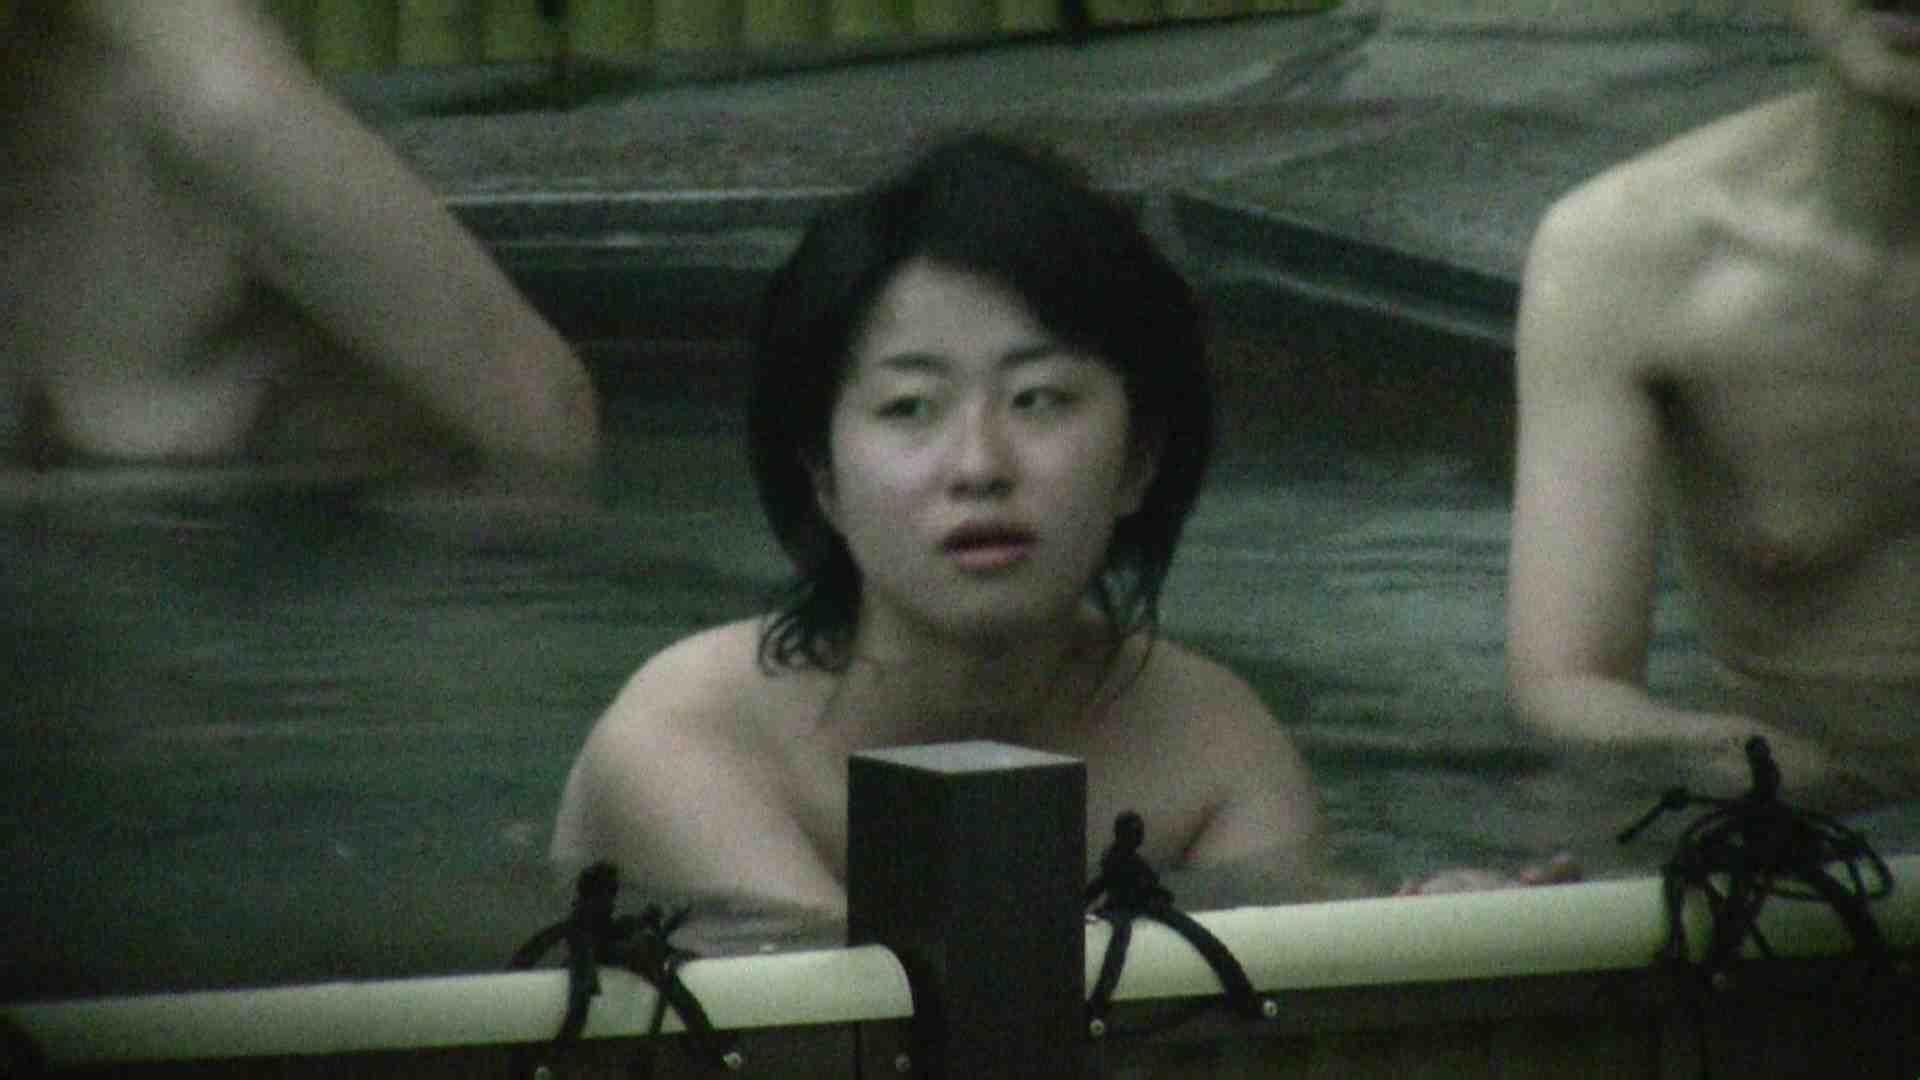 Aquaな露天風呂Vol.112 盗撮シリーズ   露天風呂編  93PIX 9